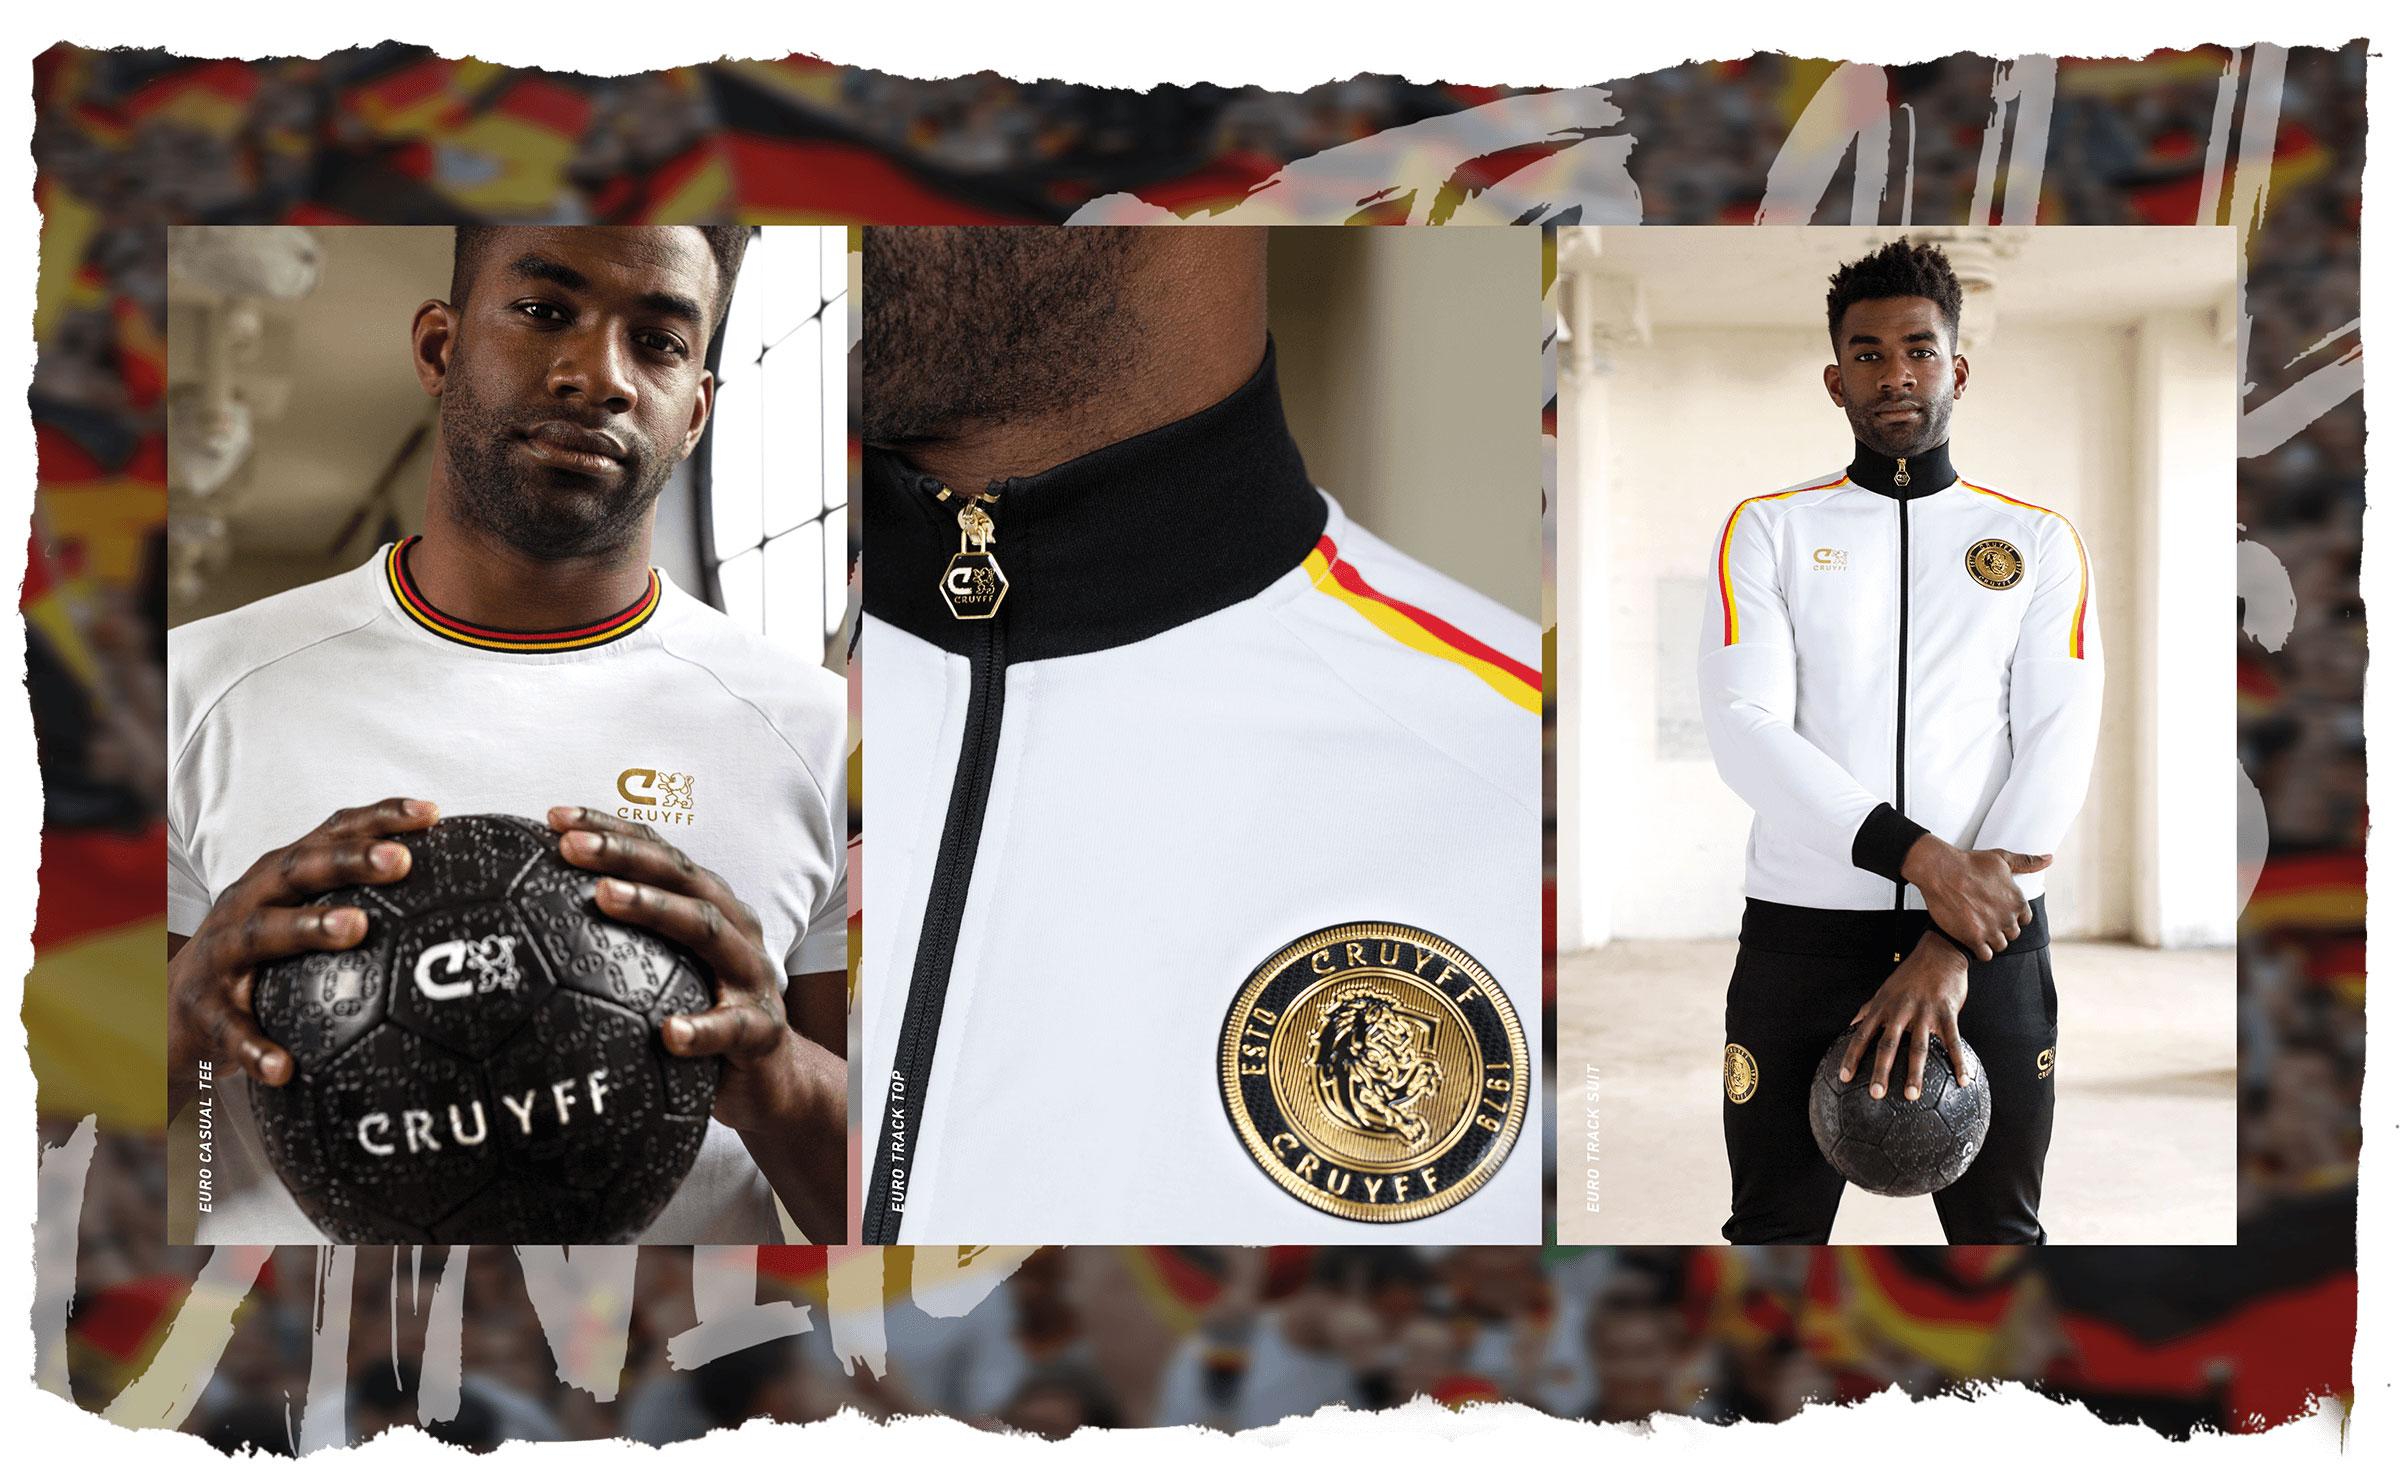 Cruyff EURO 2020 Germany Kit